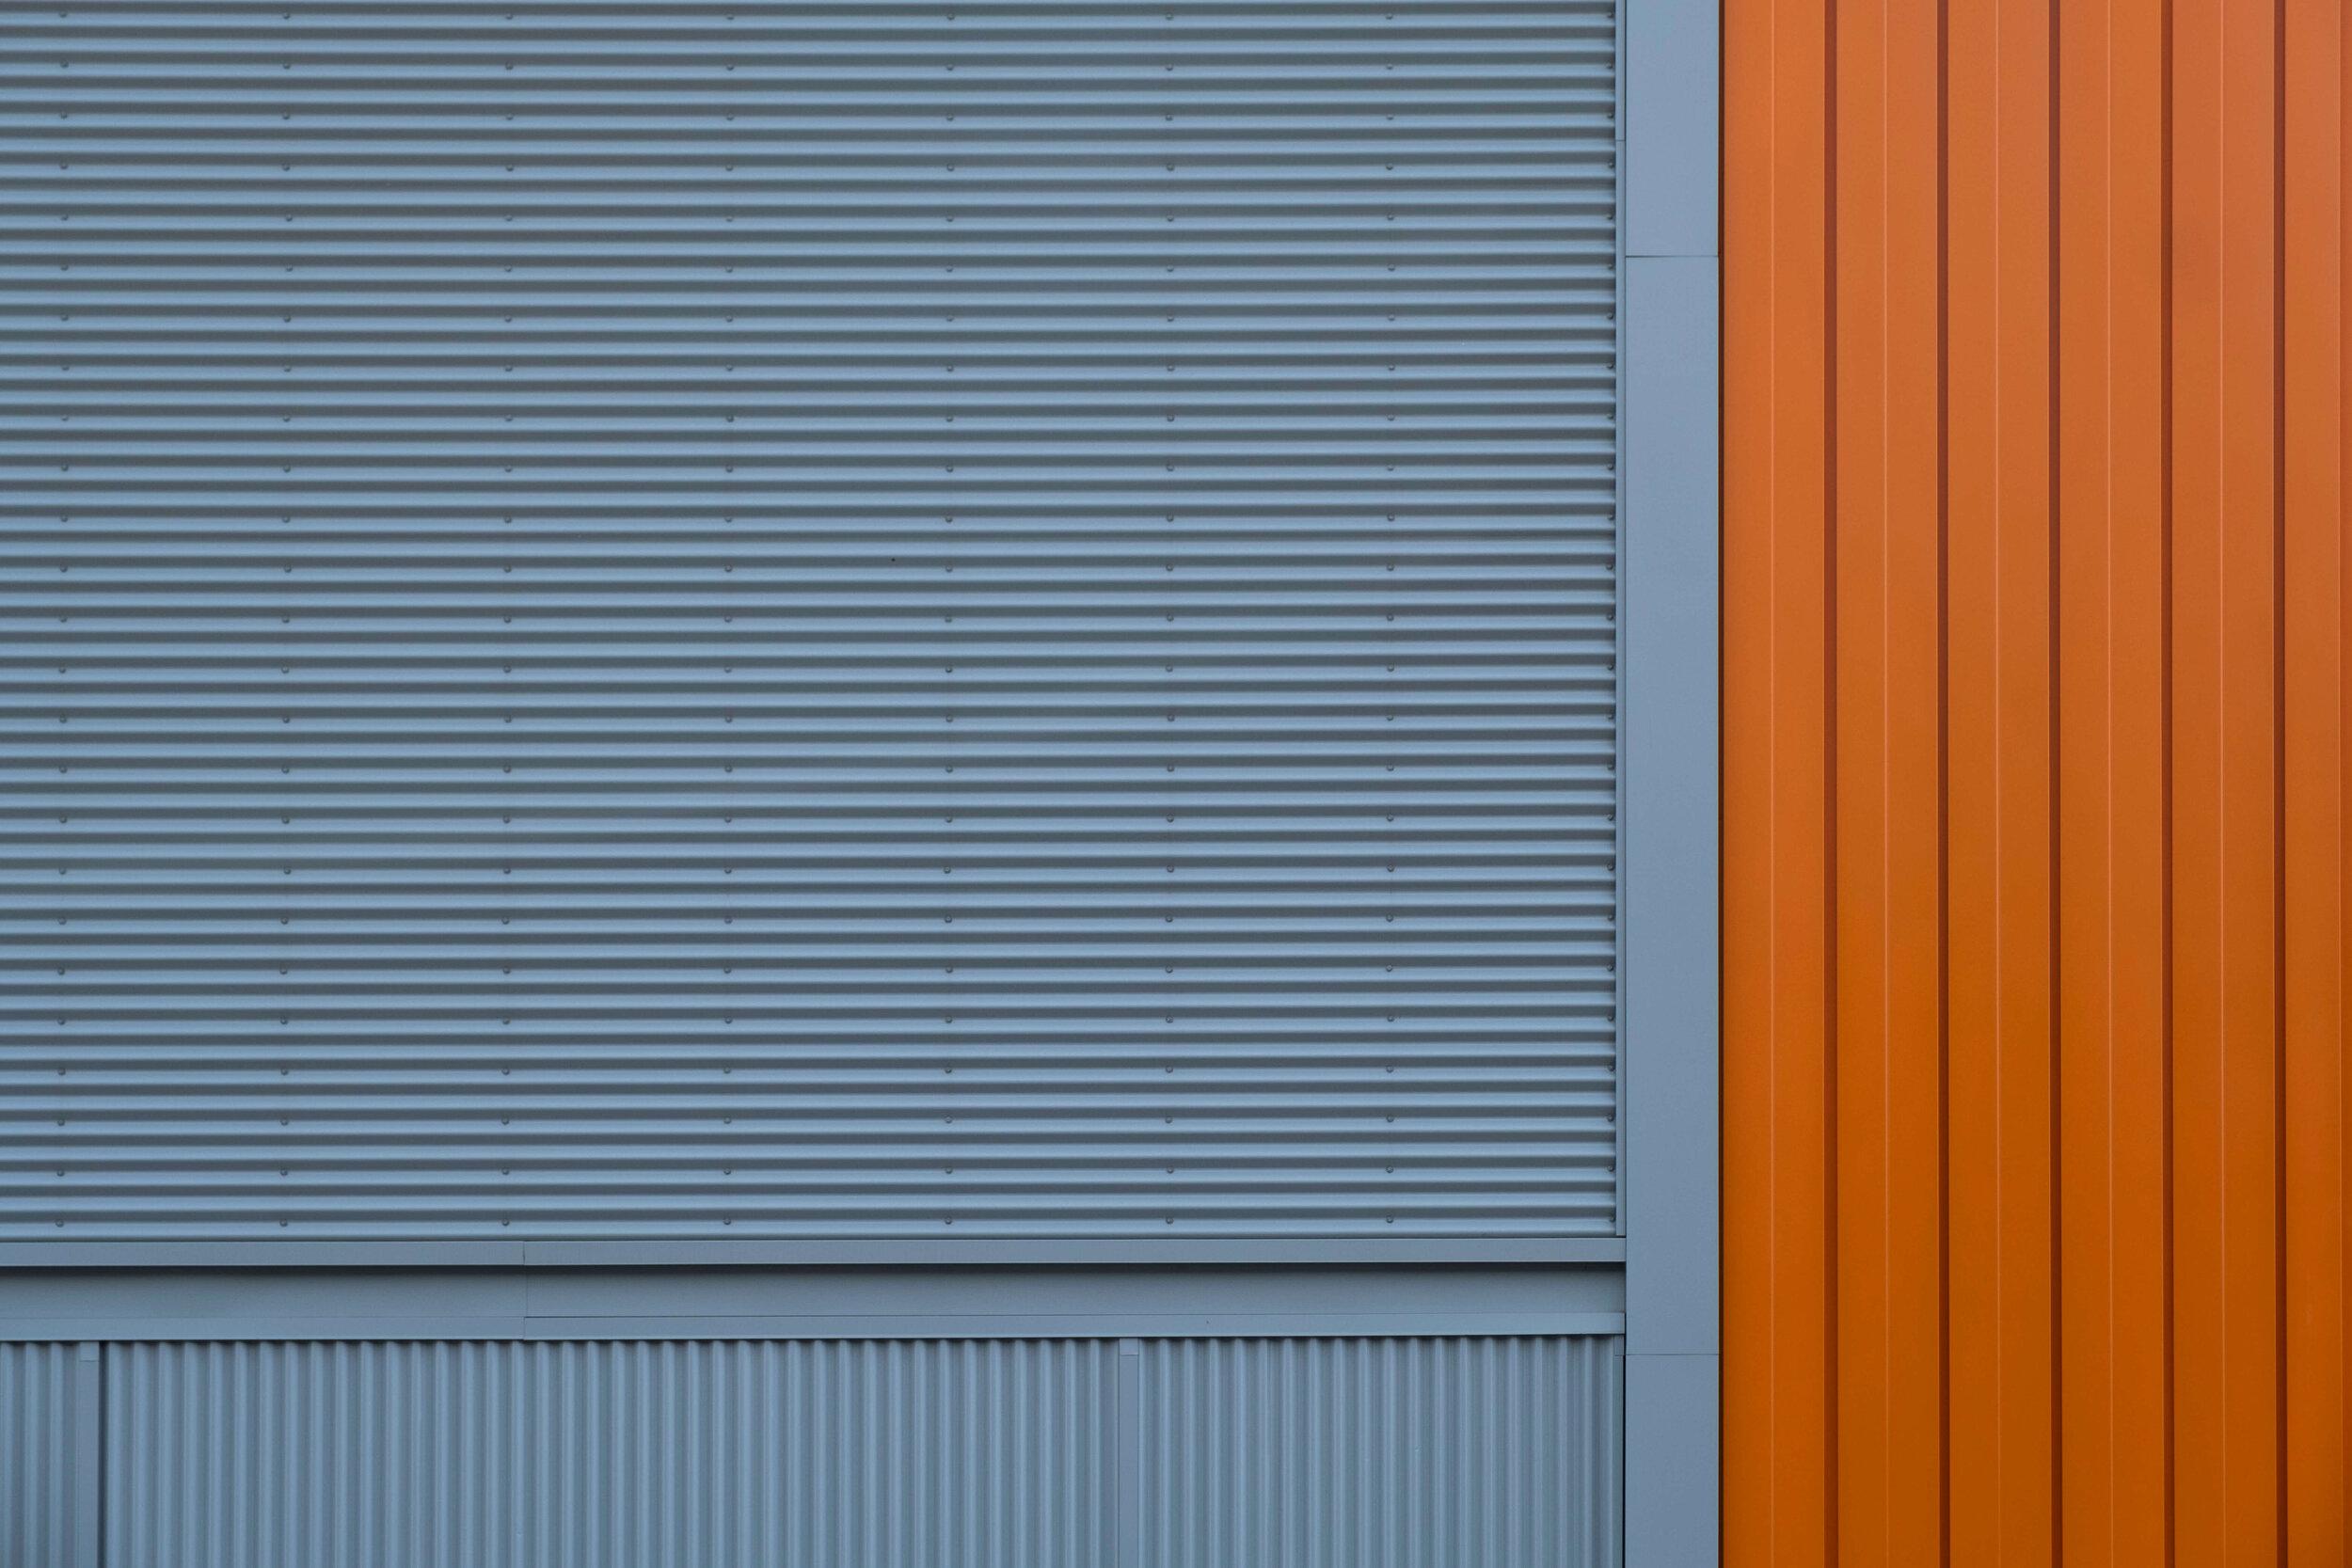 PR08 - Batisse orange_006.jpg